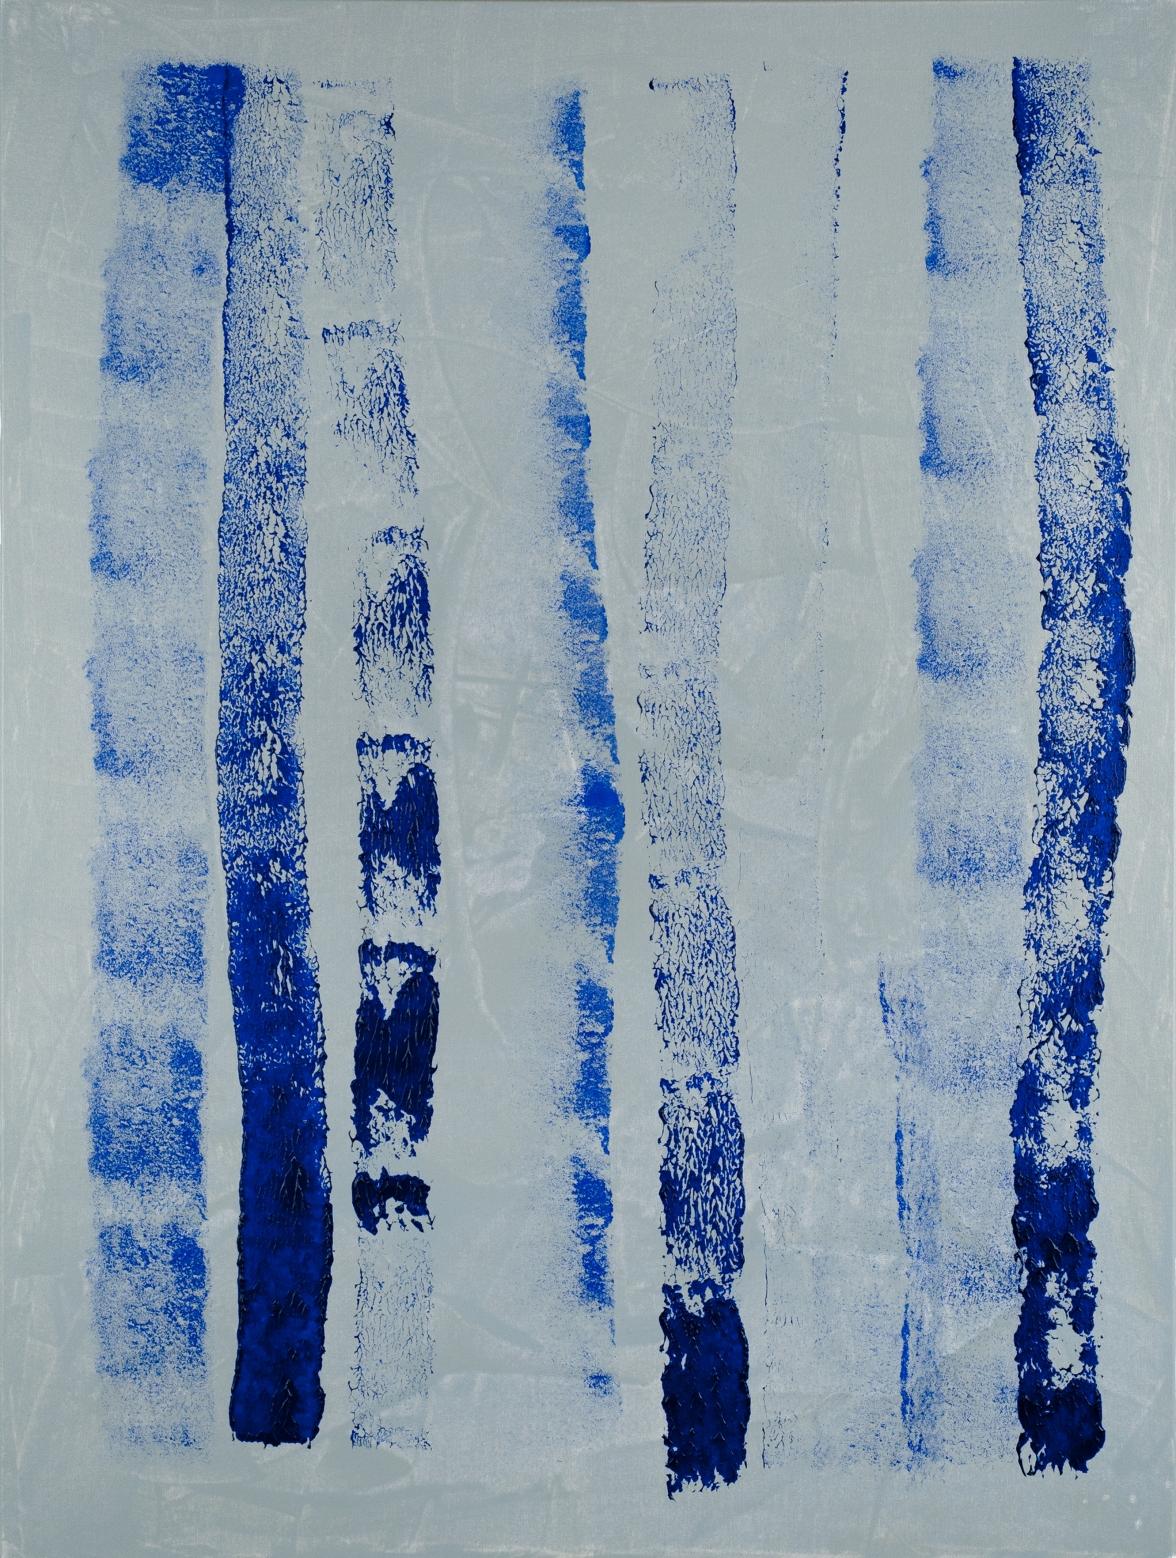 Verticales #6a blue o grey 4.2013 (36''x48'')